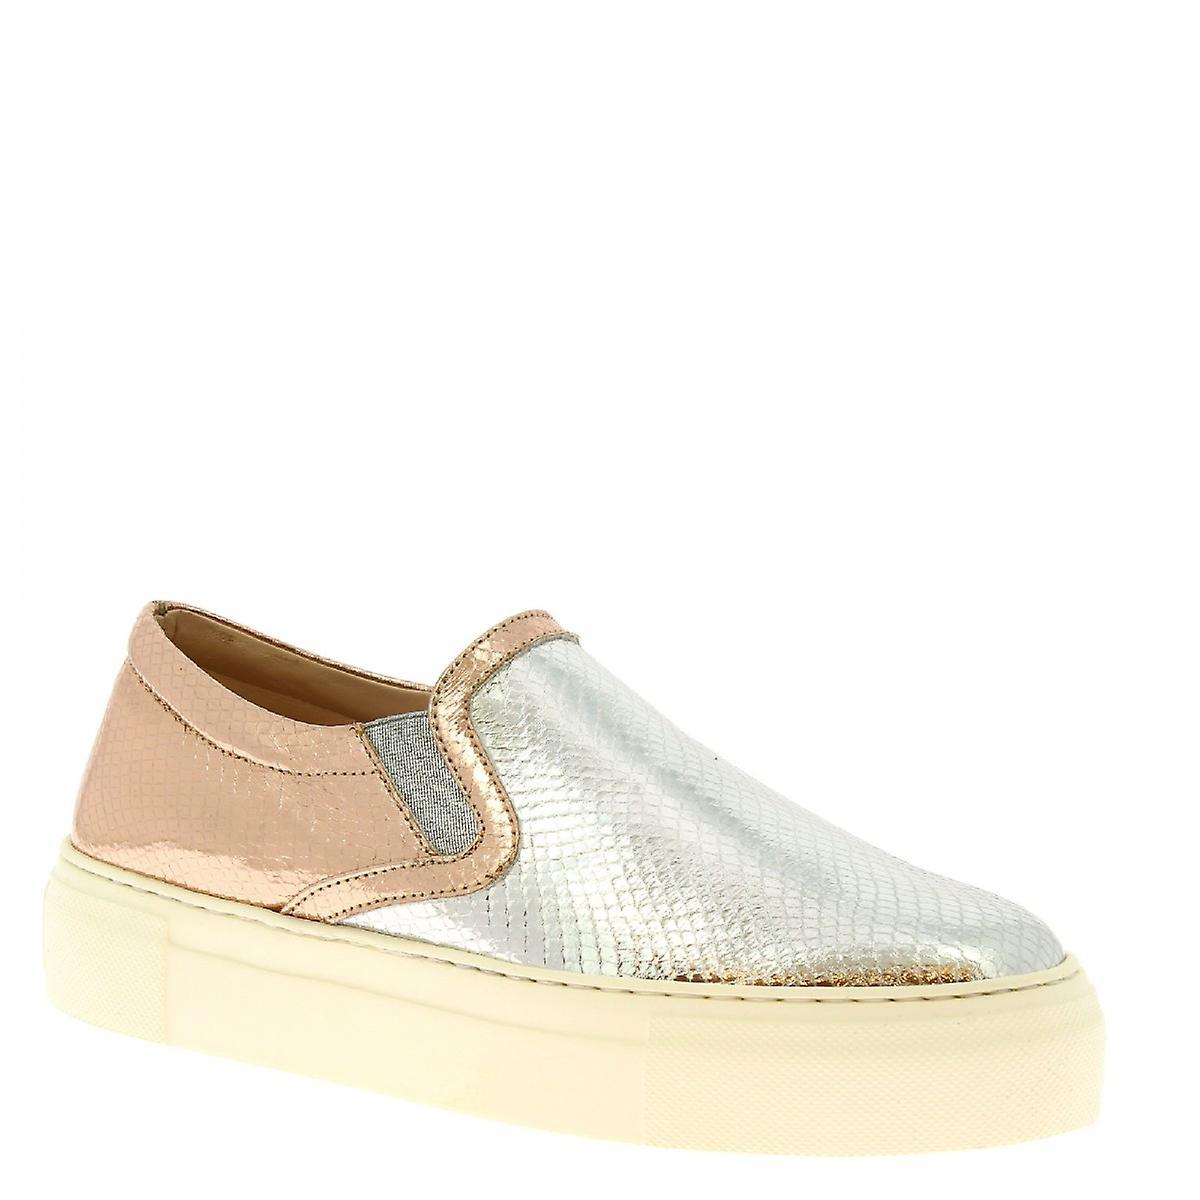 Leonardo Shoes Women's handmade slip on sneakers silver pink laminated leather U1s3o